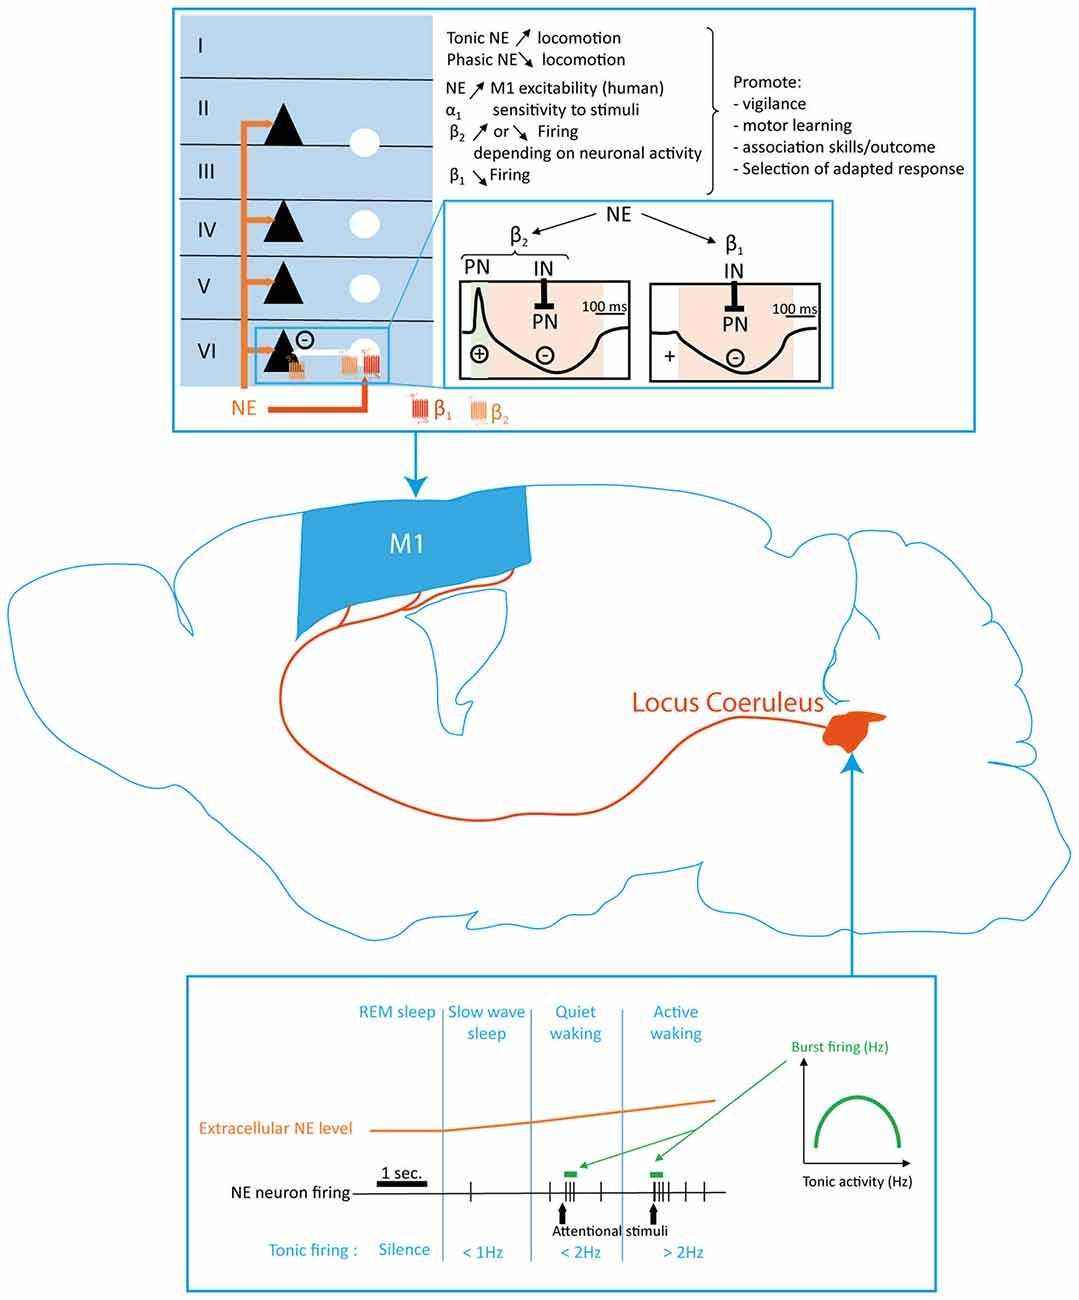 Frontiers Monoaminergic Modulation Of Motor Cortex Function Schematic For Remington 1100 Gnewsinfocom